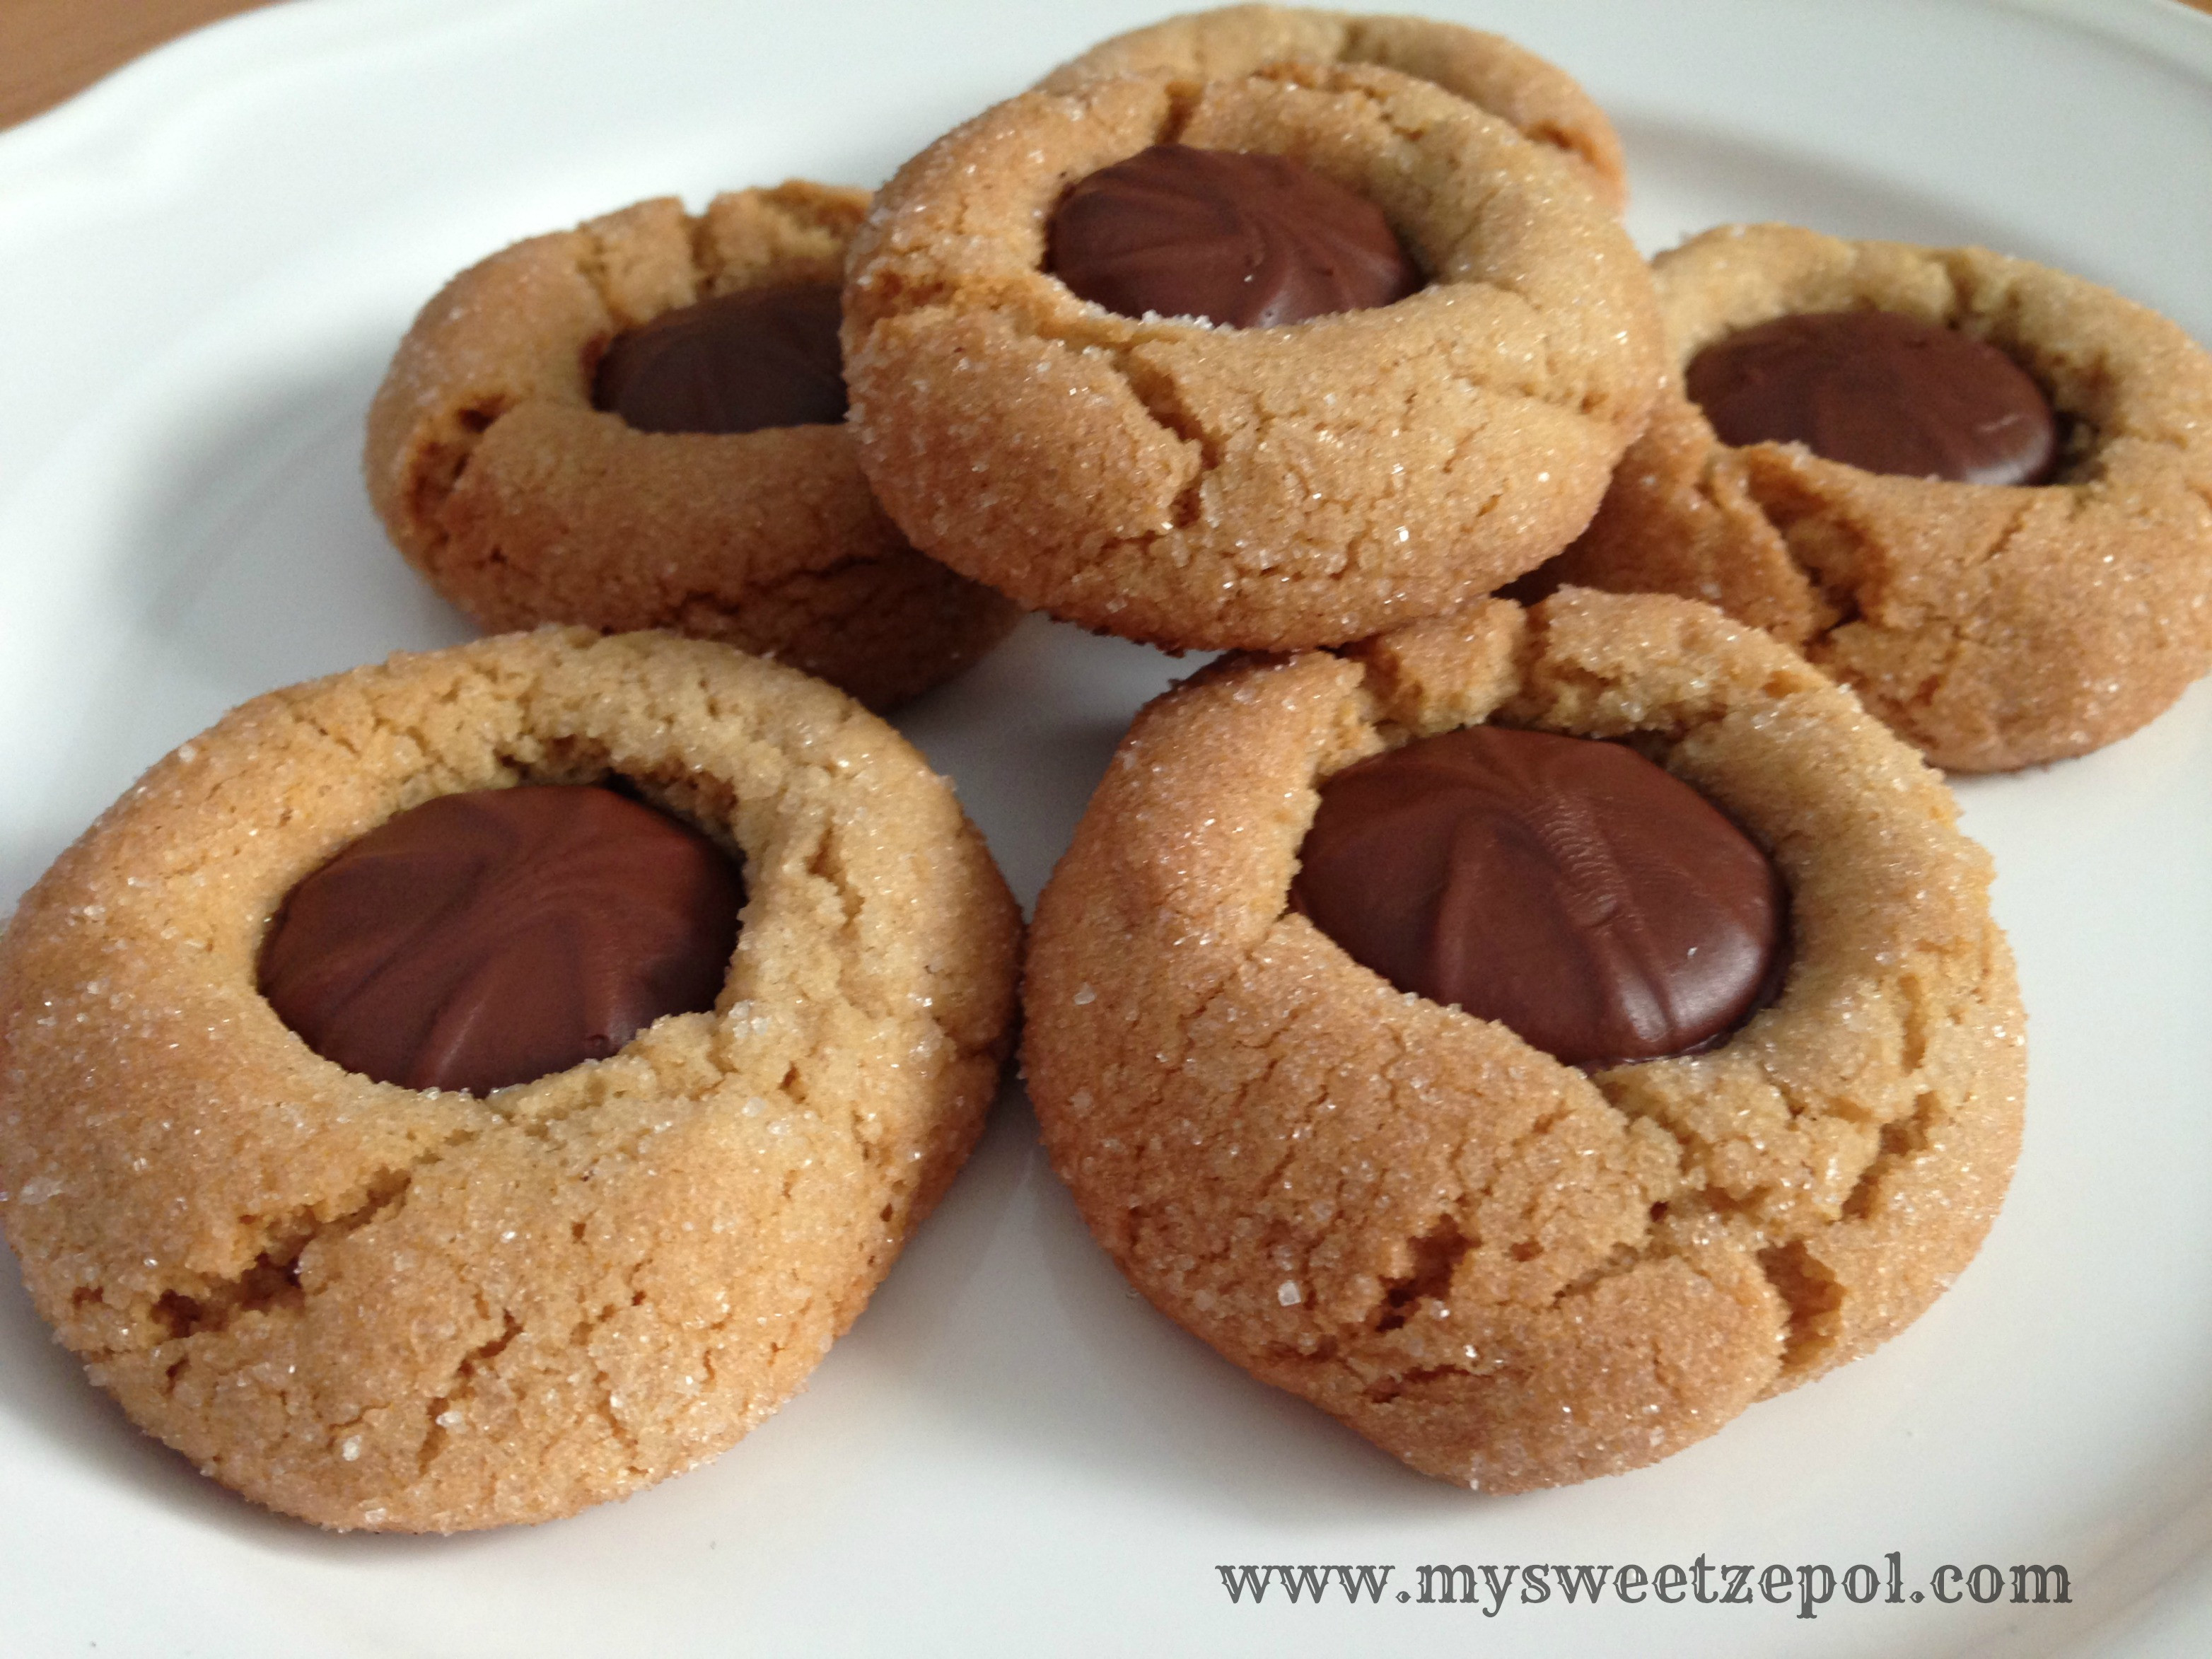 Peanut Butter Chocolate Cookies  Peanut Butter Chocolate Cookies My Sweet Zepol